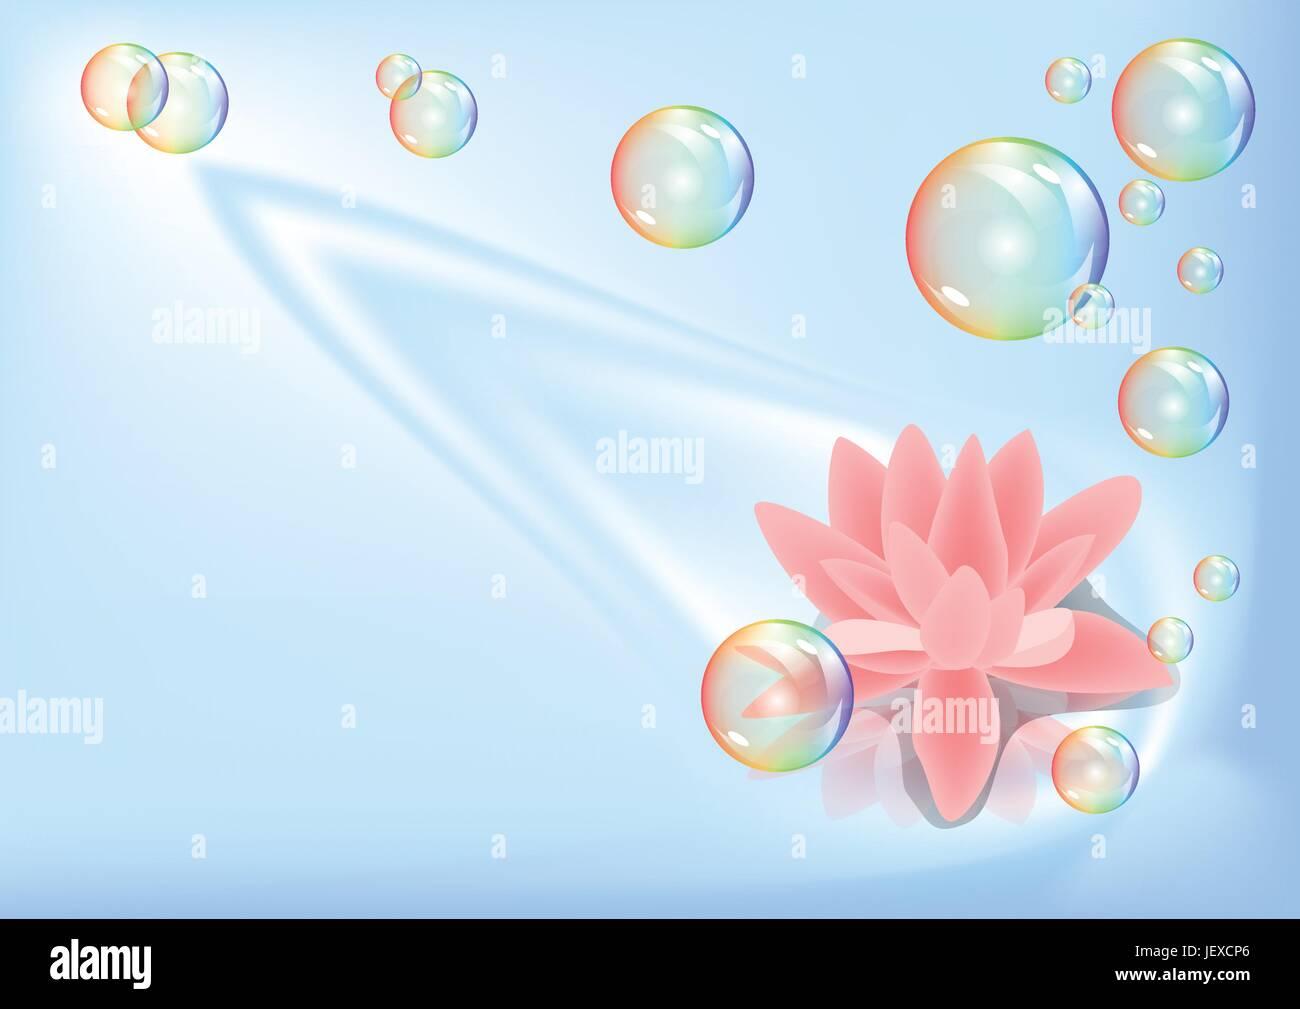 single, flower, plant, bloom, blossom, flourish, flourishing, lily, summer, - Stock Vector